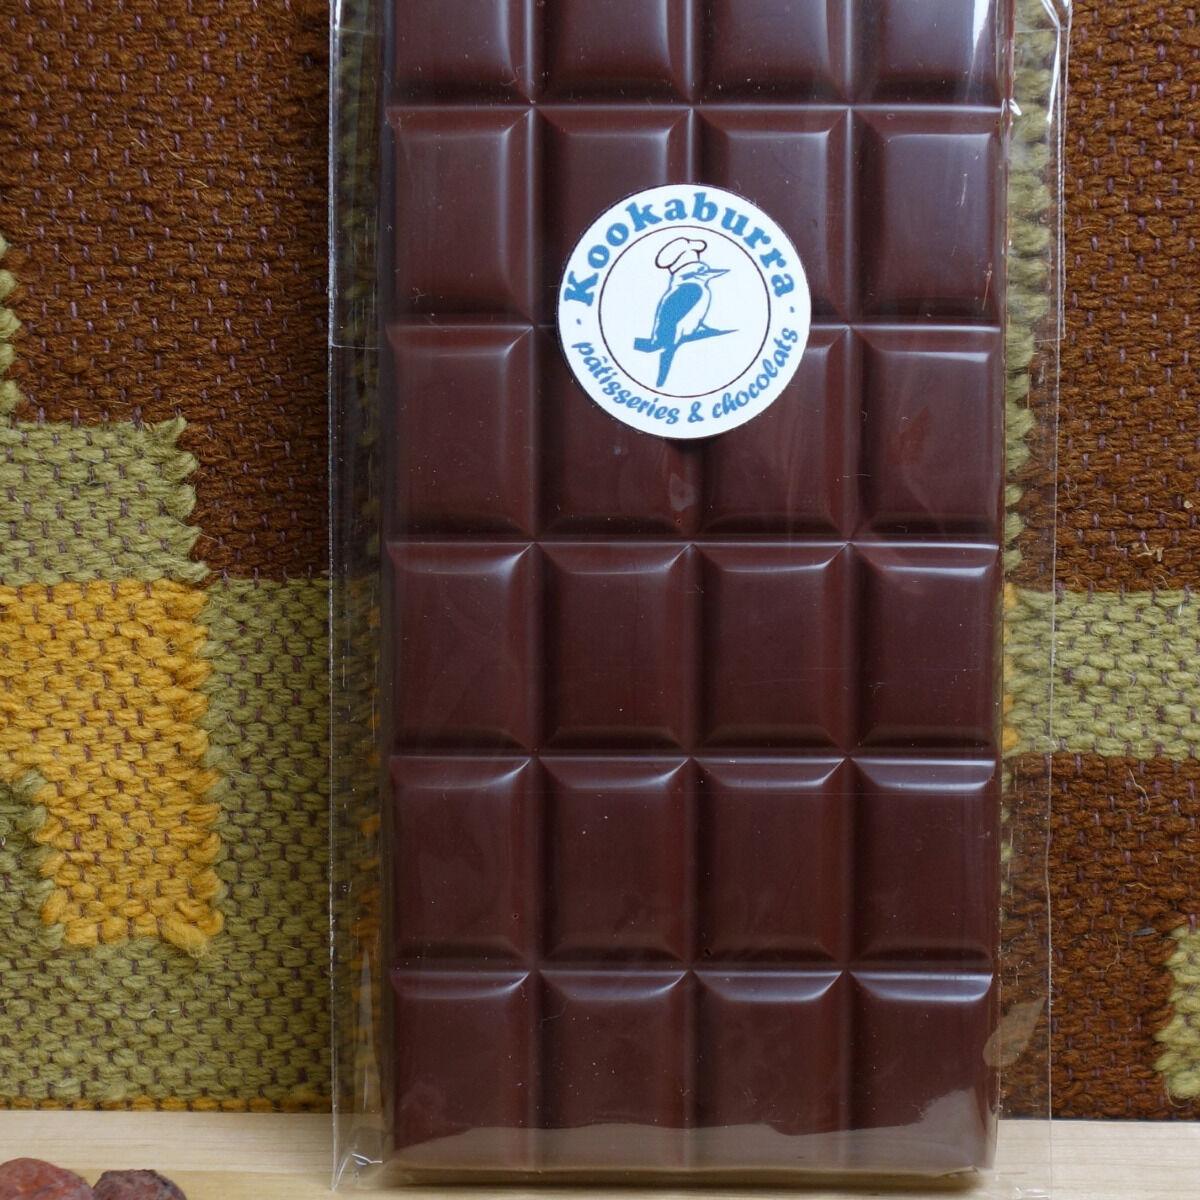 Pâtisserie Kookaburra Tablette Chocolat Noir 70% Criollo